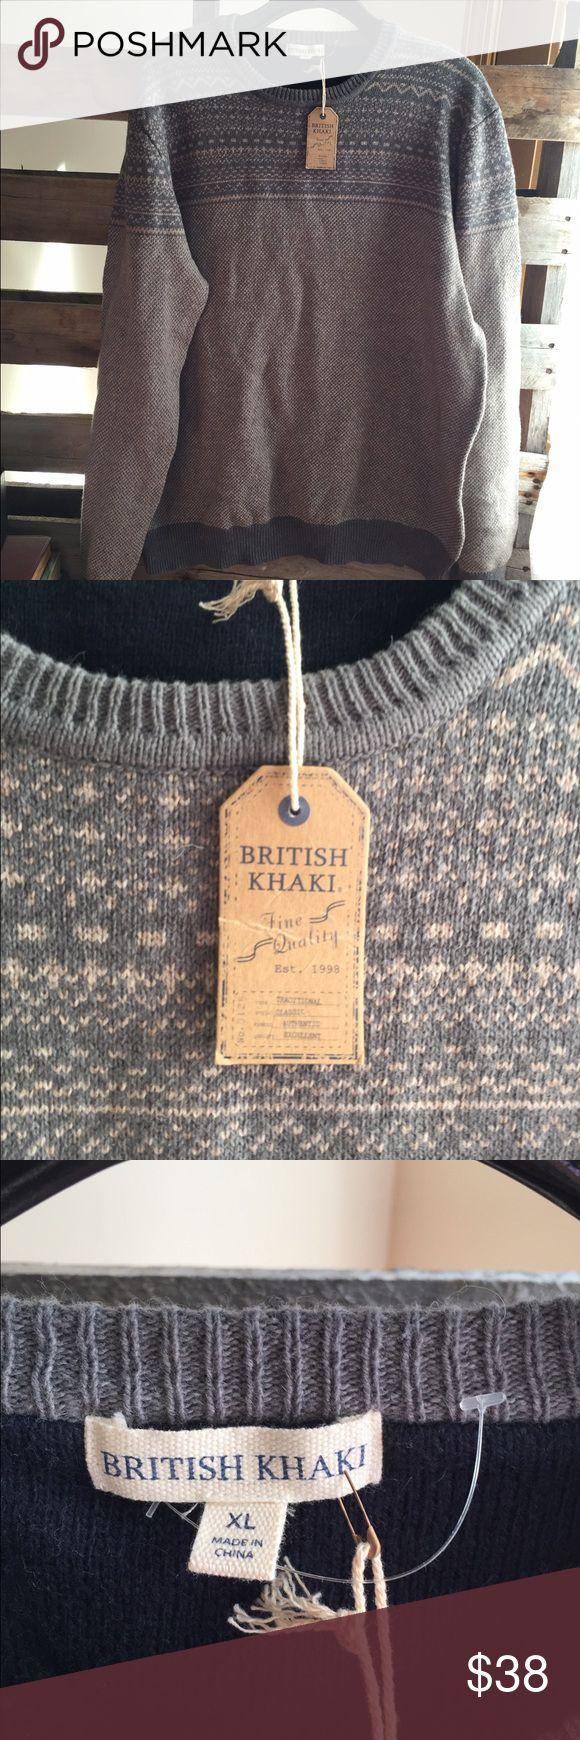 British Khaki sweater lambswool/cotton XL NWT Smoke and pet free home. Bundle discount 20% british khaki Sweaters Crewneck